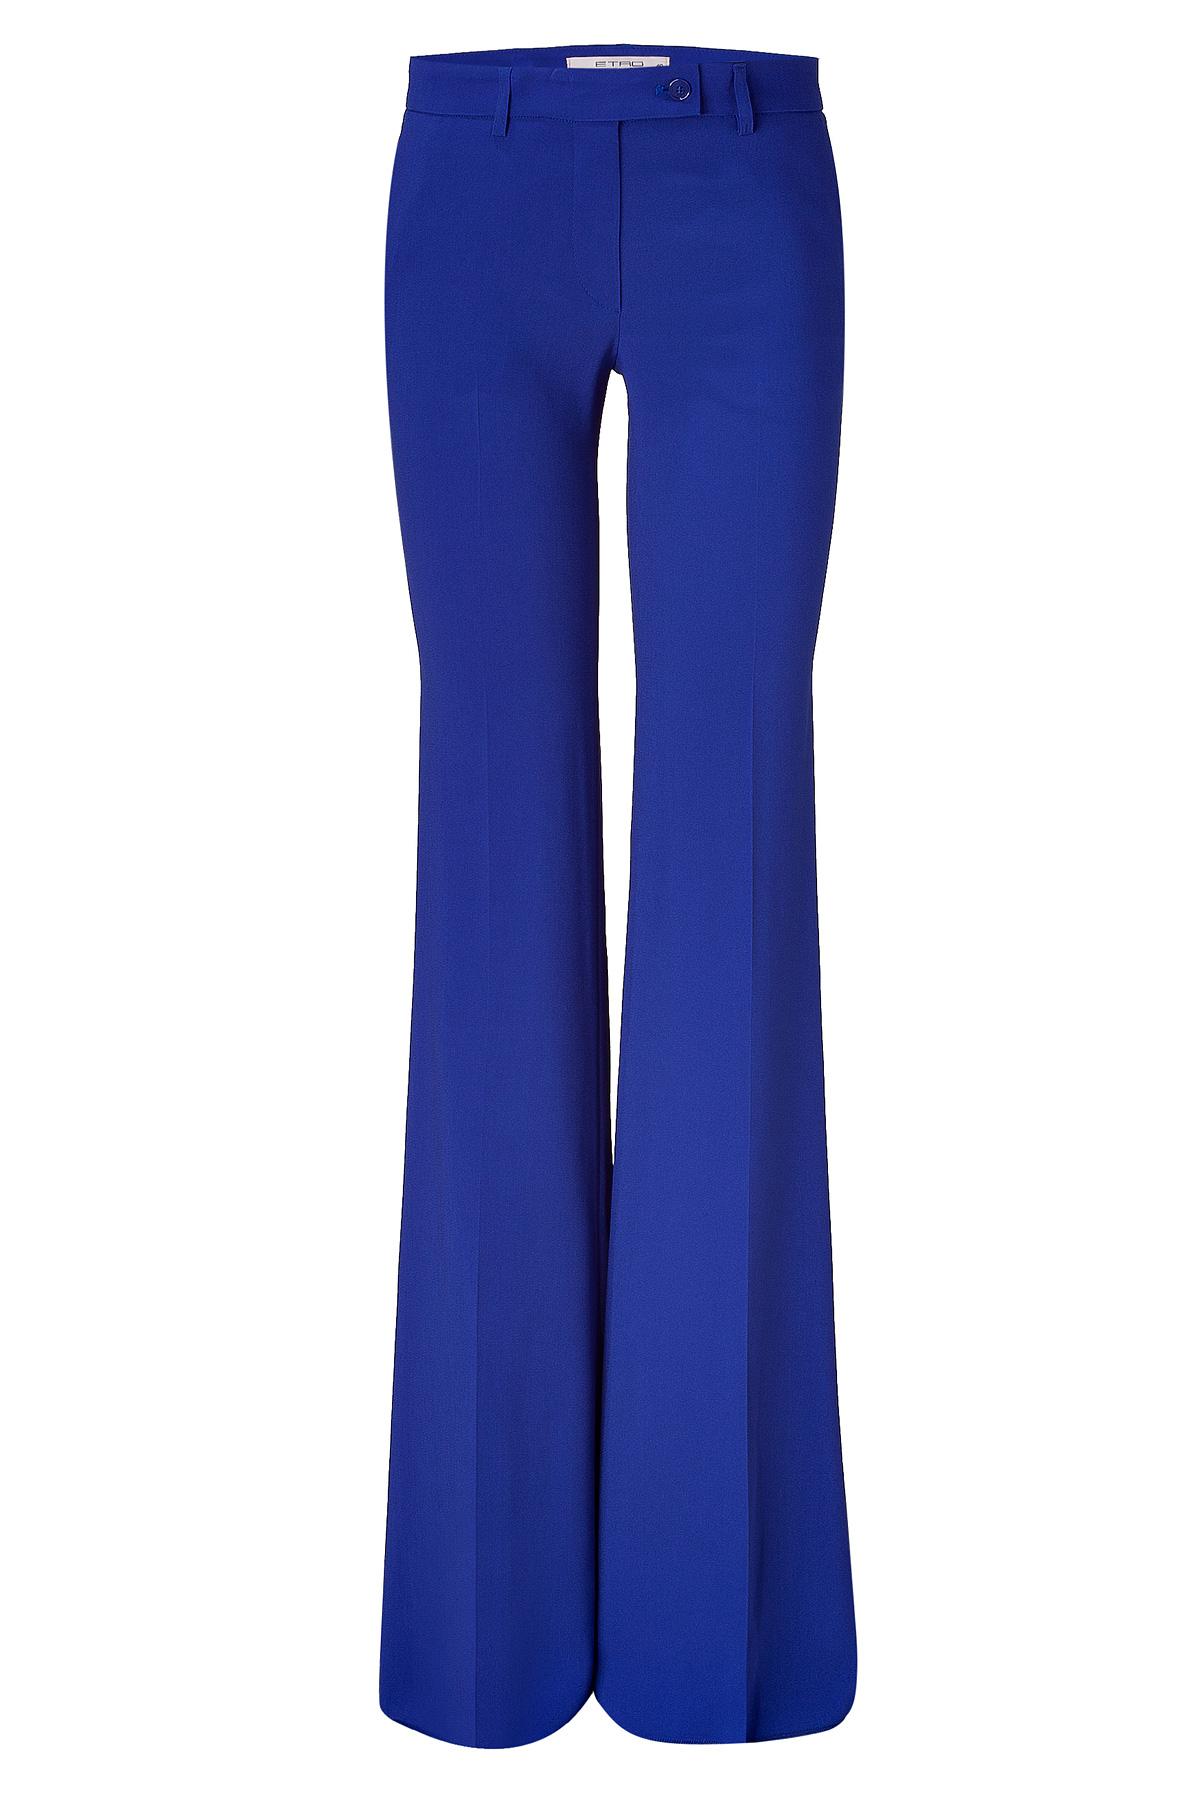 Etro Royal Blue Wide Leg Pants in Blue   Lyst